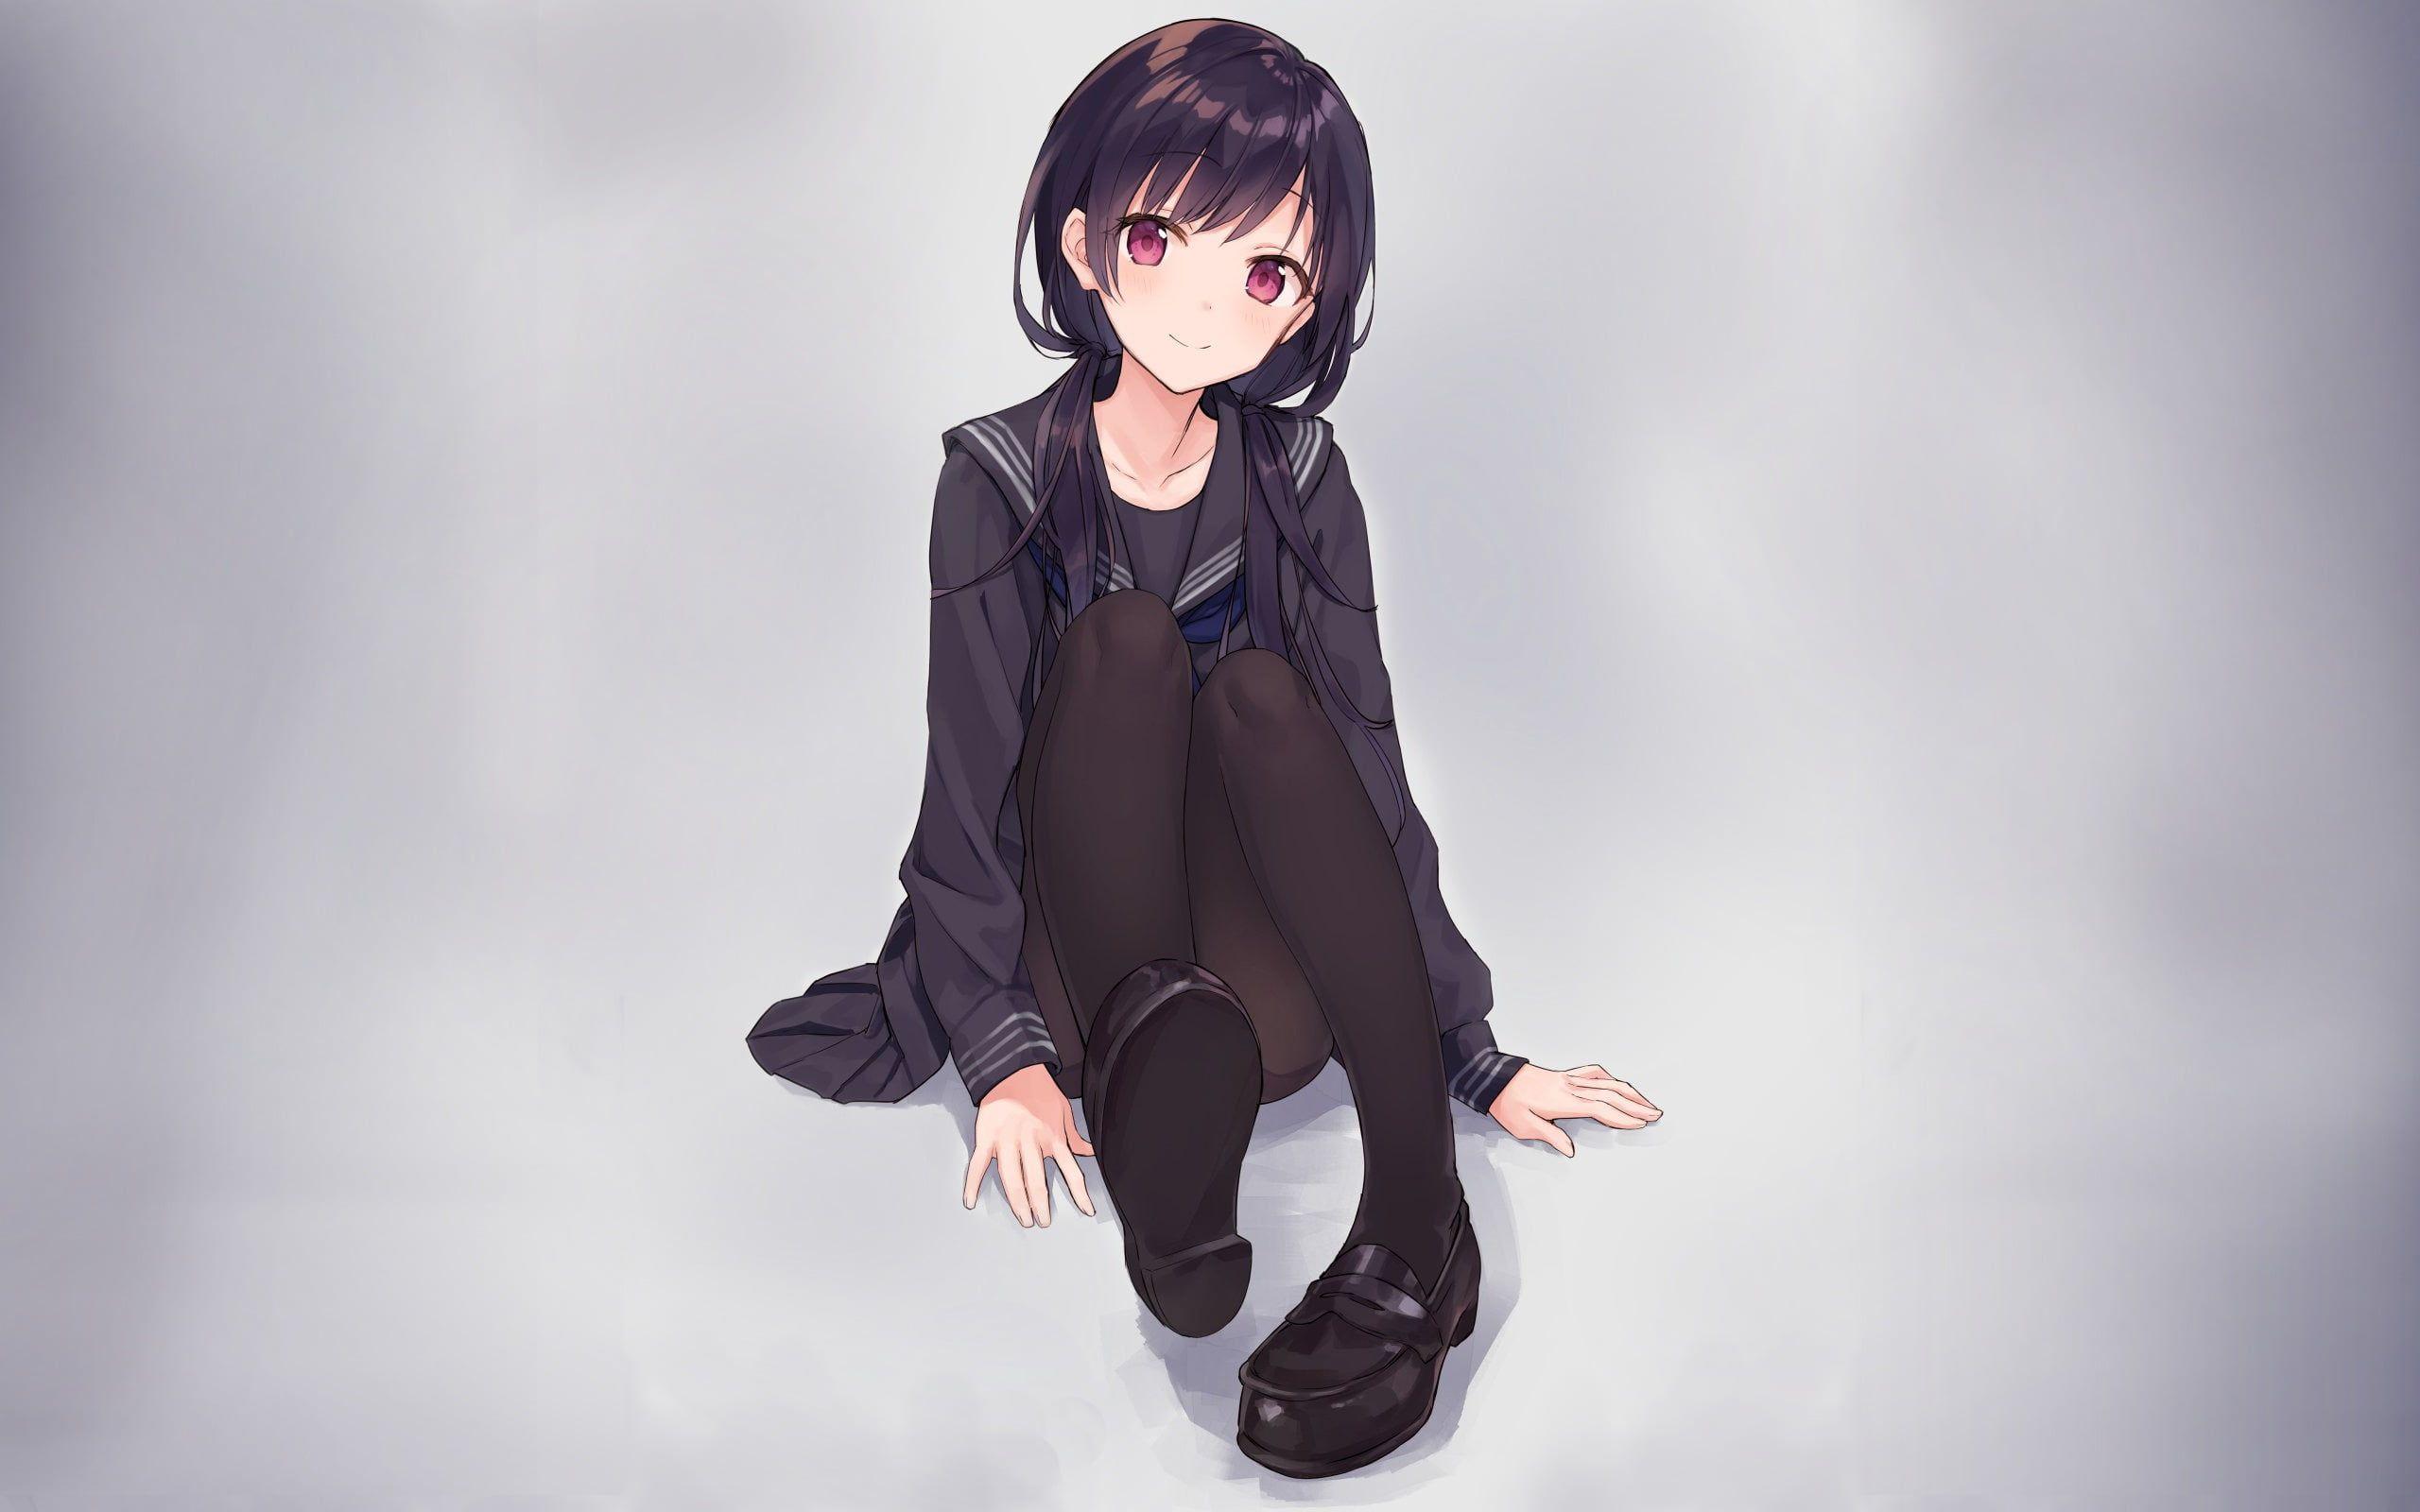 Pin On Anime High Quality Anime wallpaper black hair